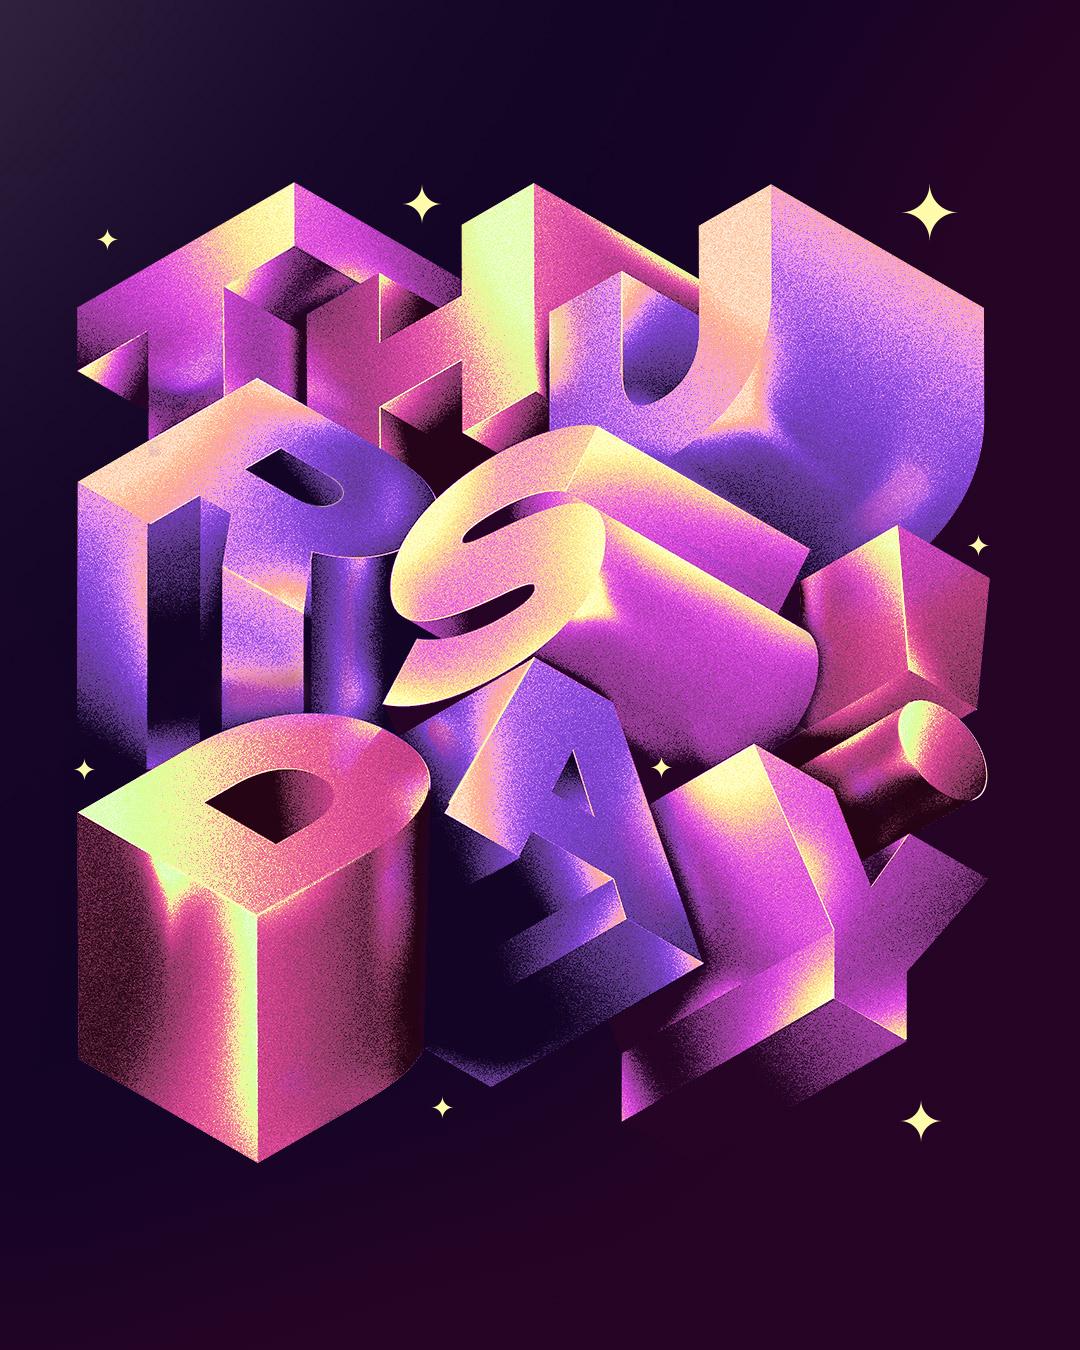 adobe hope hustwilson iridescent Monday type experiment GoodType typeexperiment typegoodness